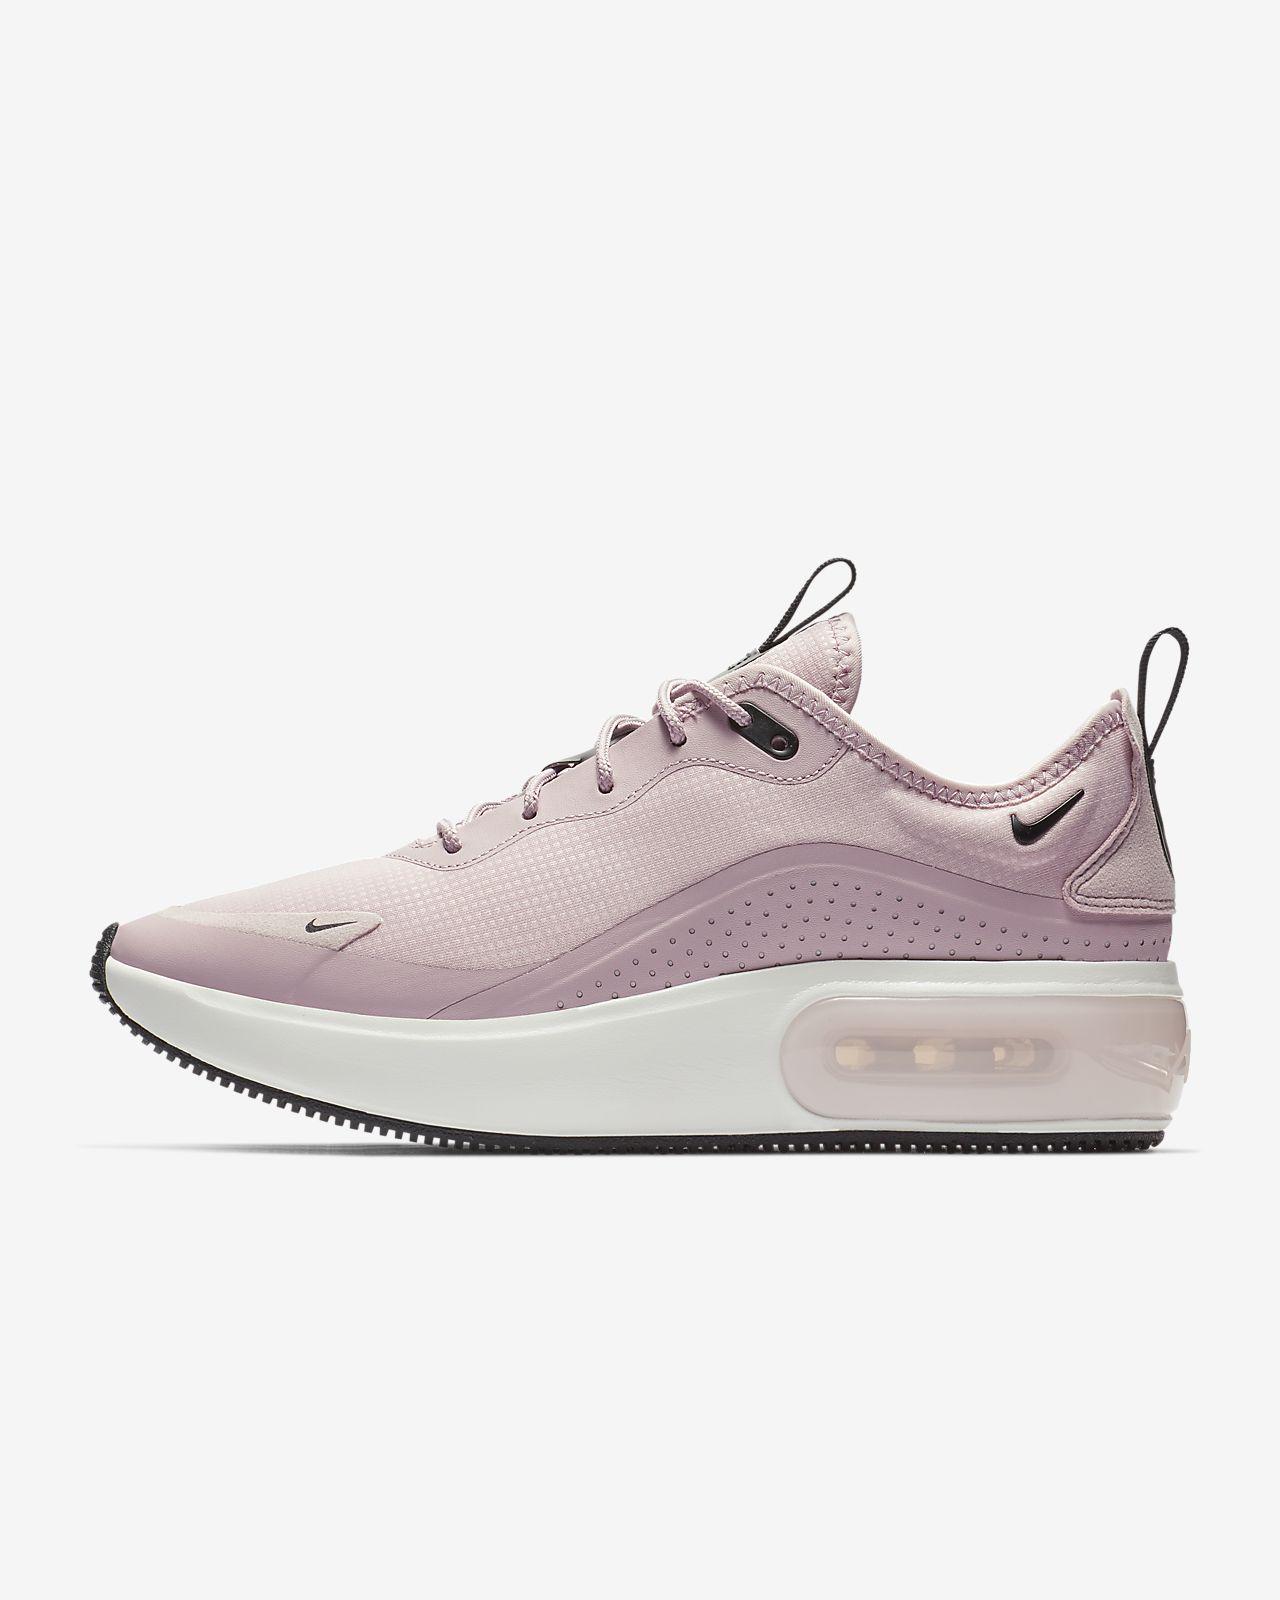 Nike Air Max Dia Damesschoen